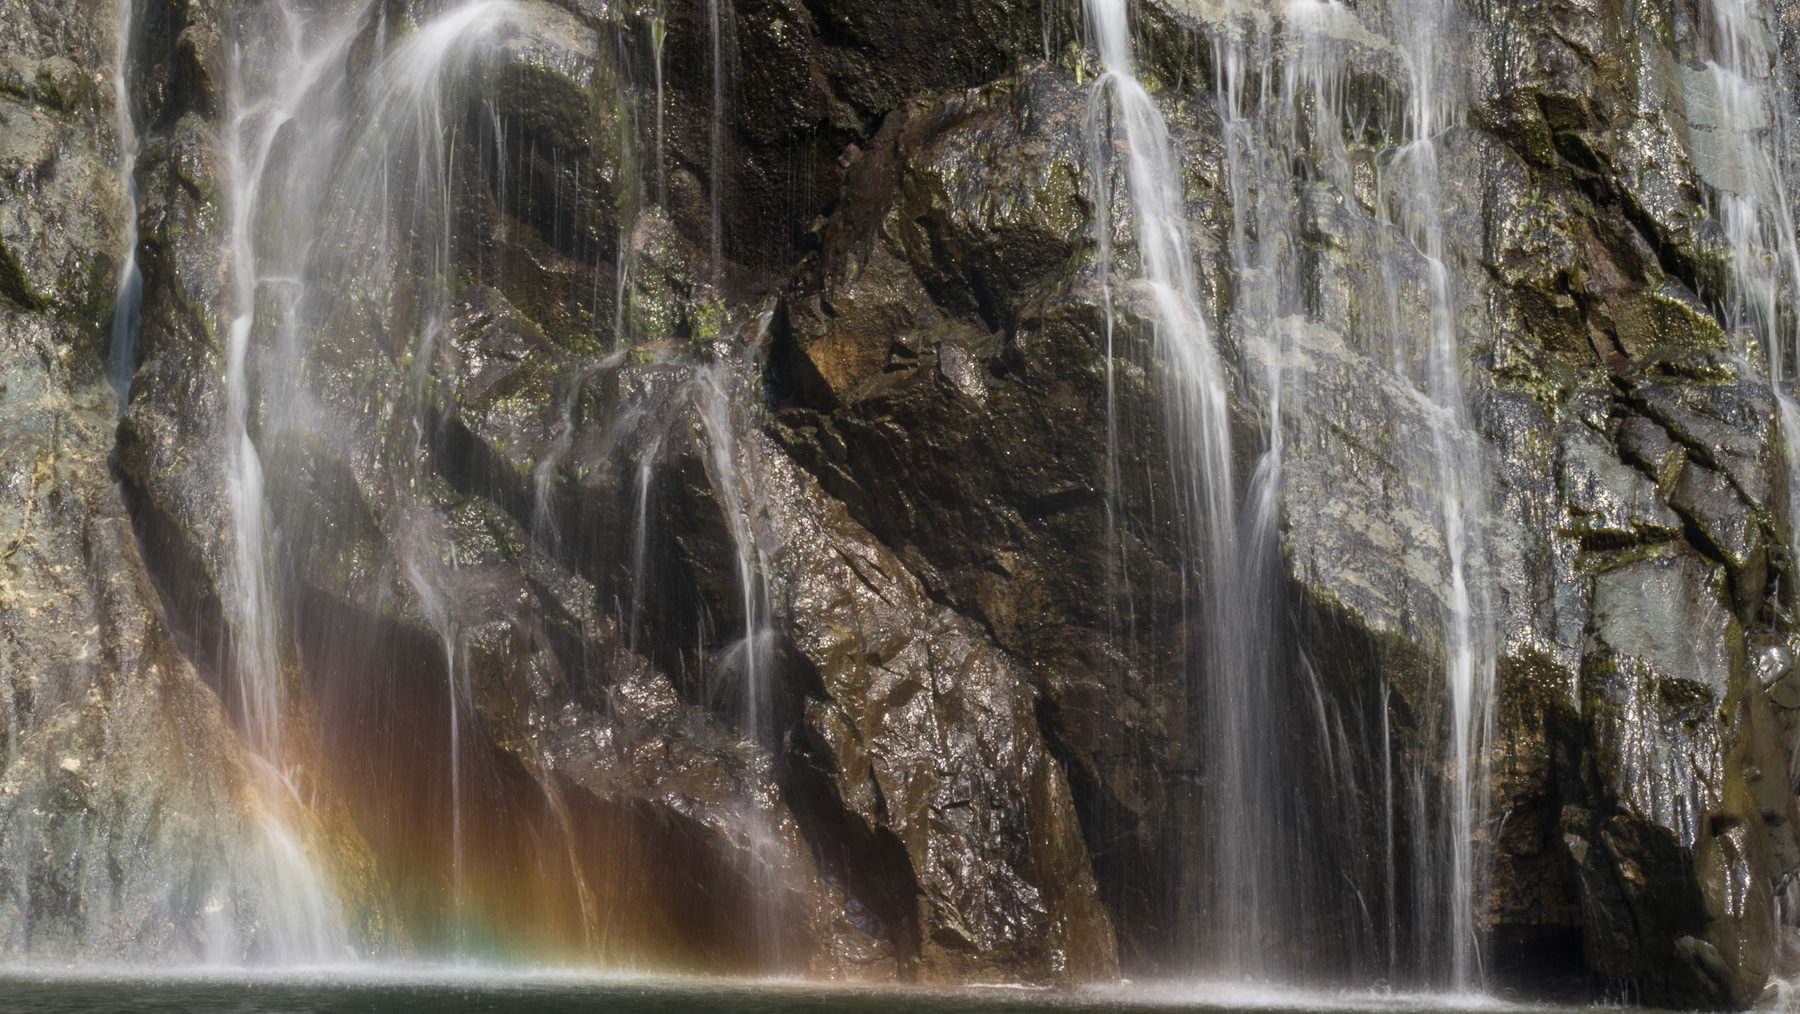 Wasserfall Idylle